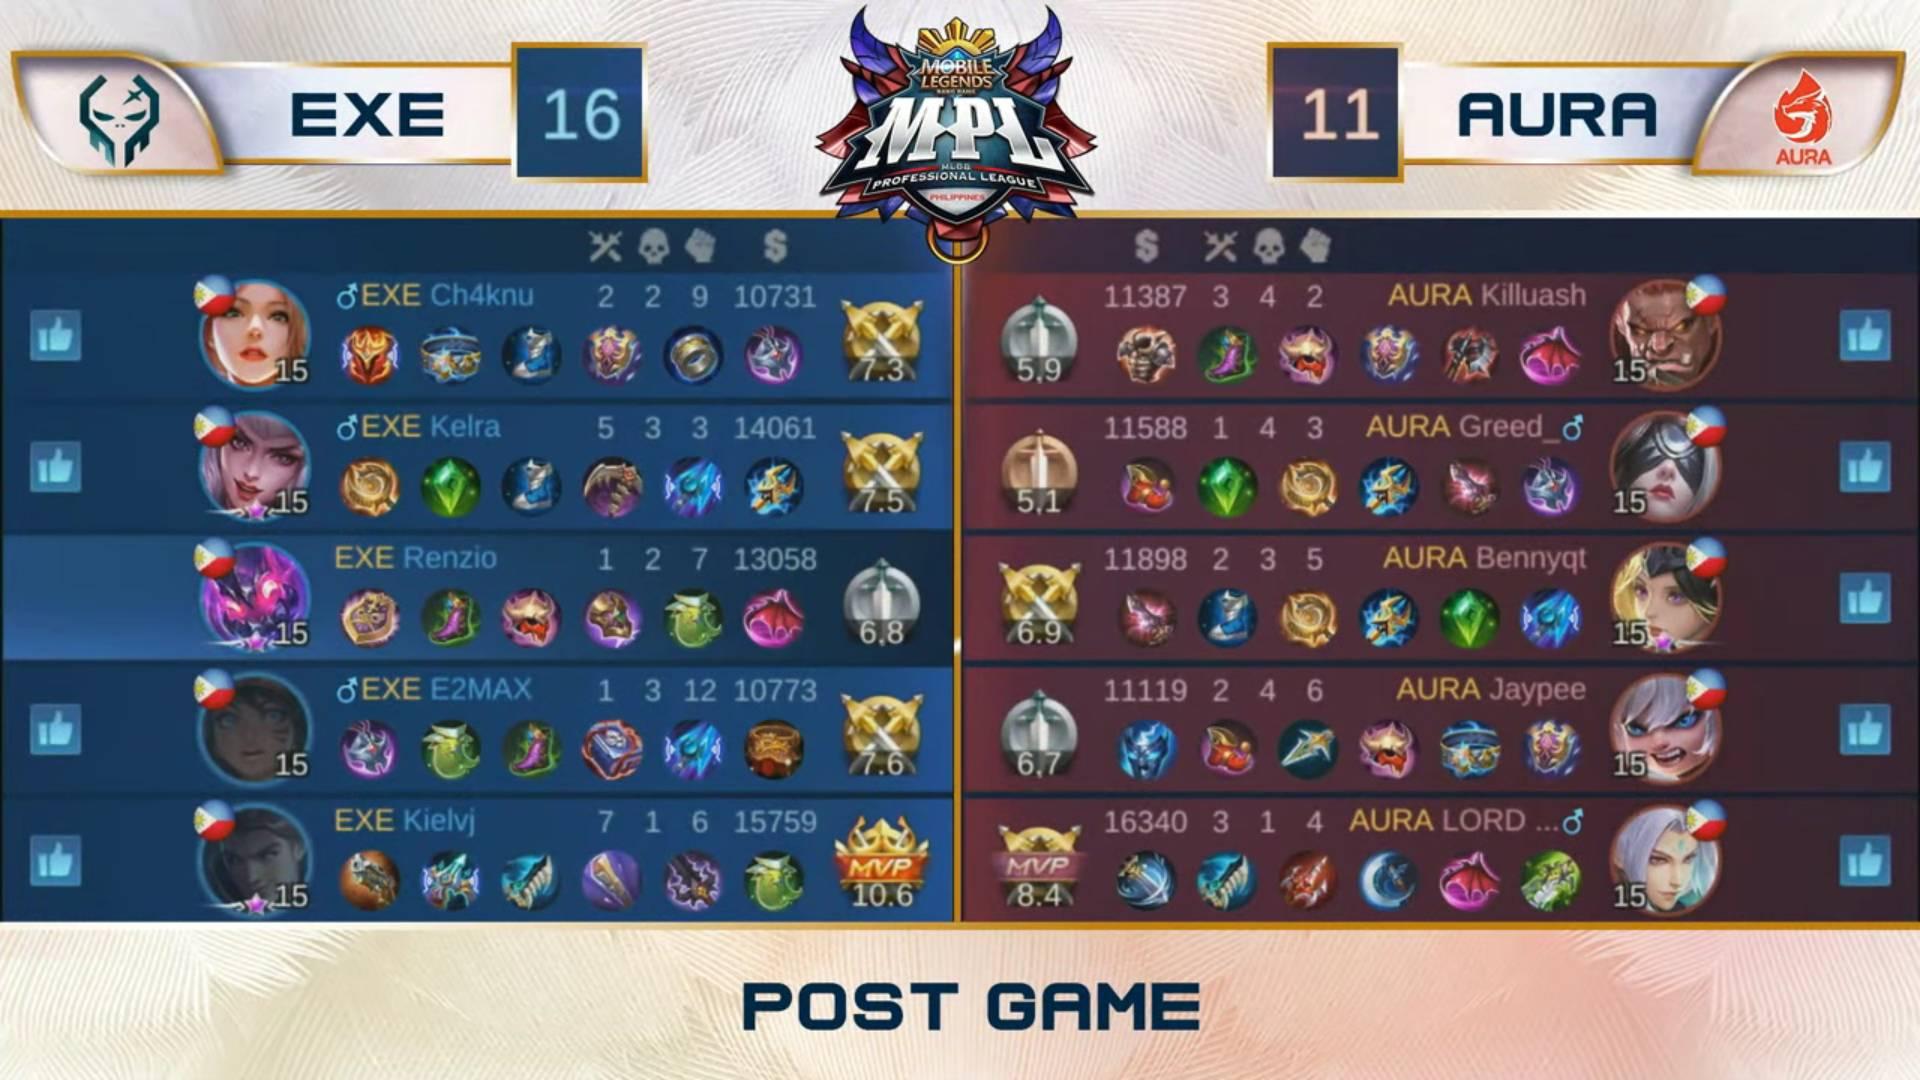 MPL-PH-Season-7-semis-Execration-def-Aura-PH-Game-3 Kielvj gets back at Aura PH as Execration ends MPL PH Finals drought ESports Mobile Legends MPL-PH News  - philippine sports news